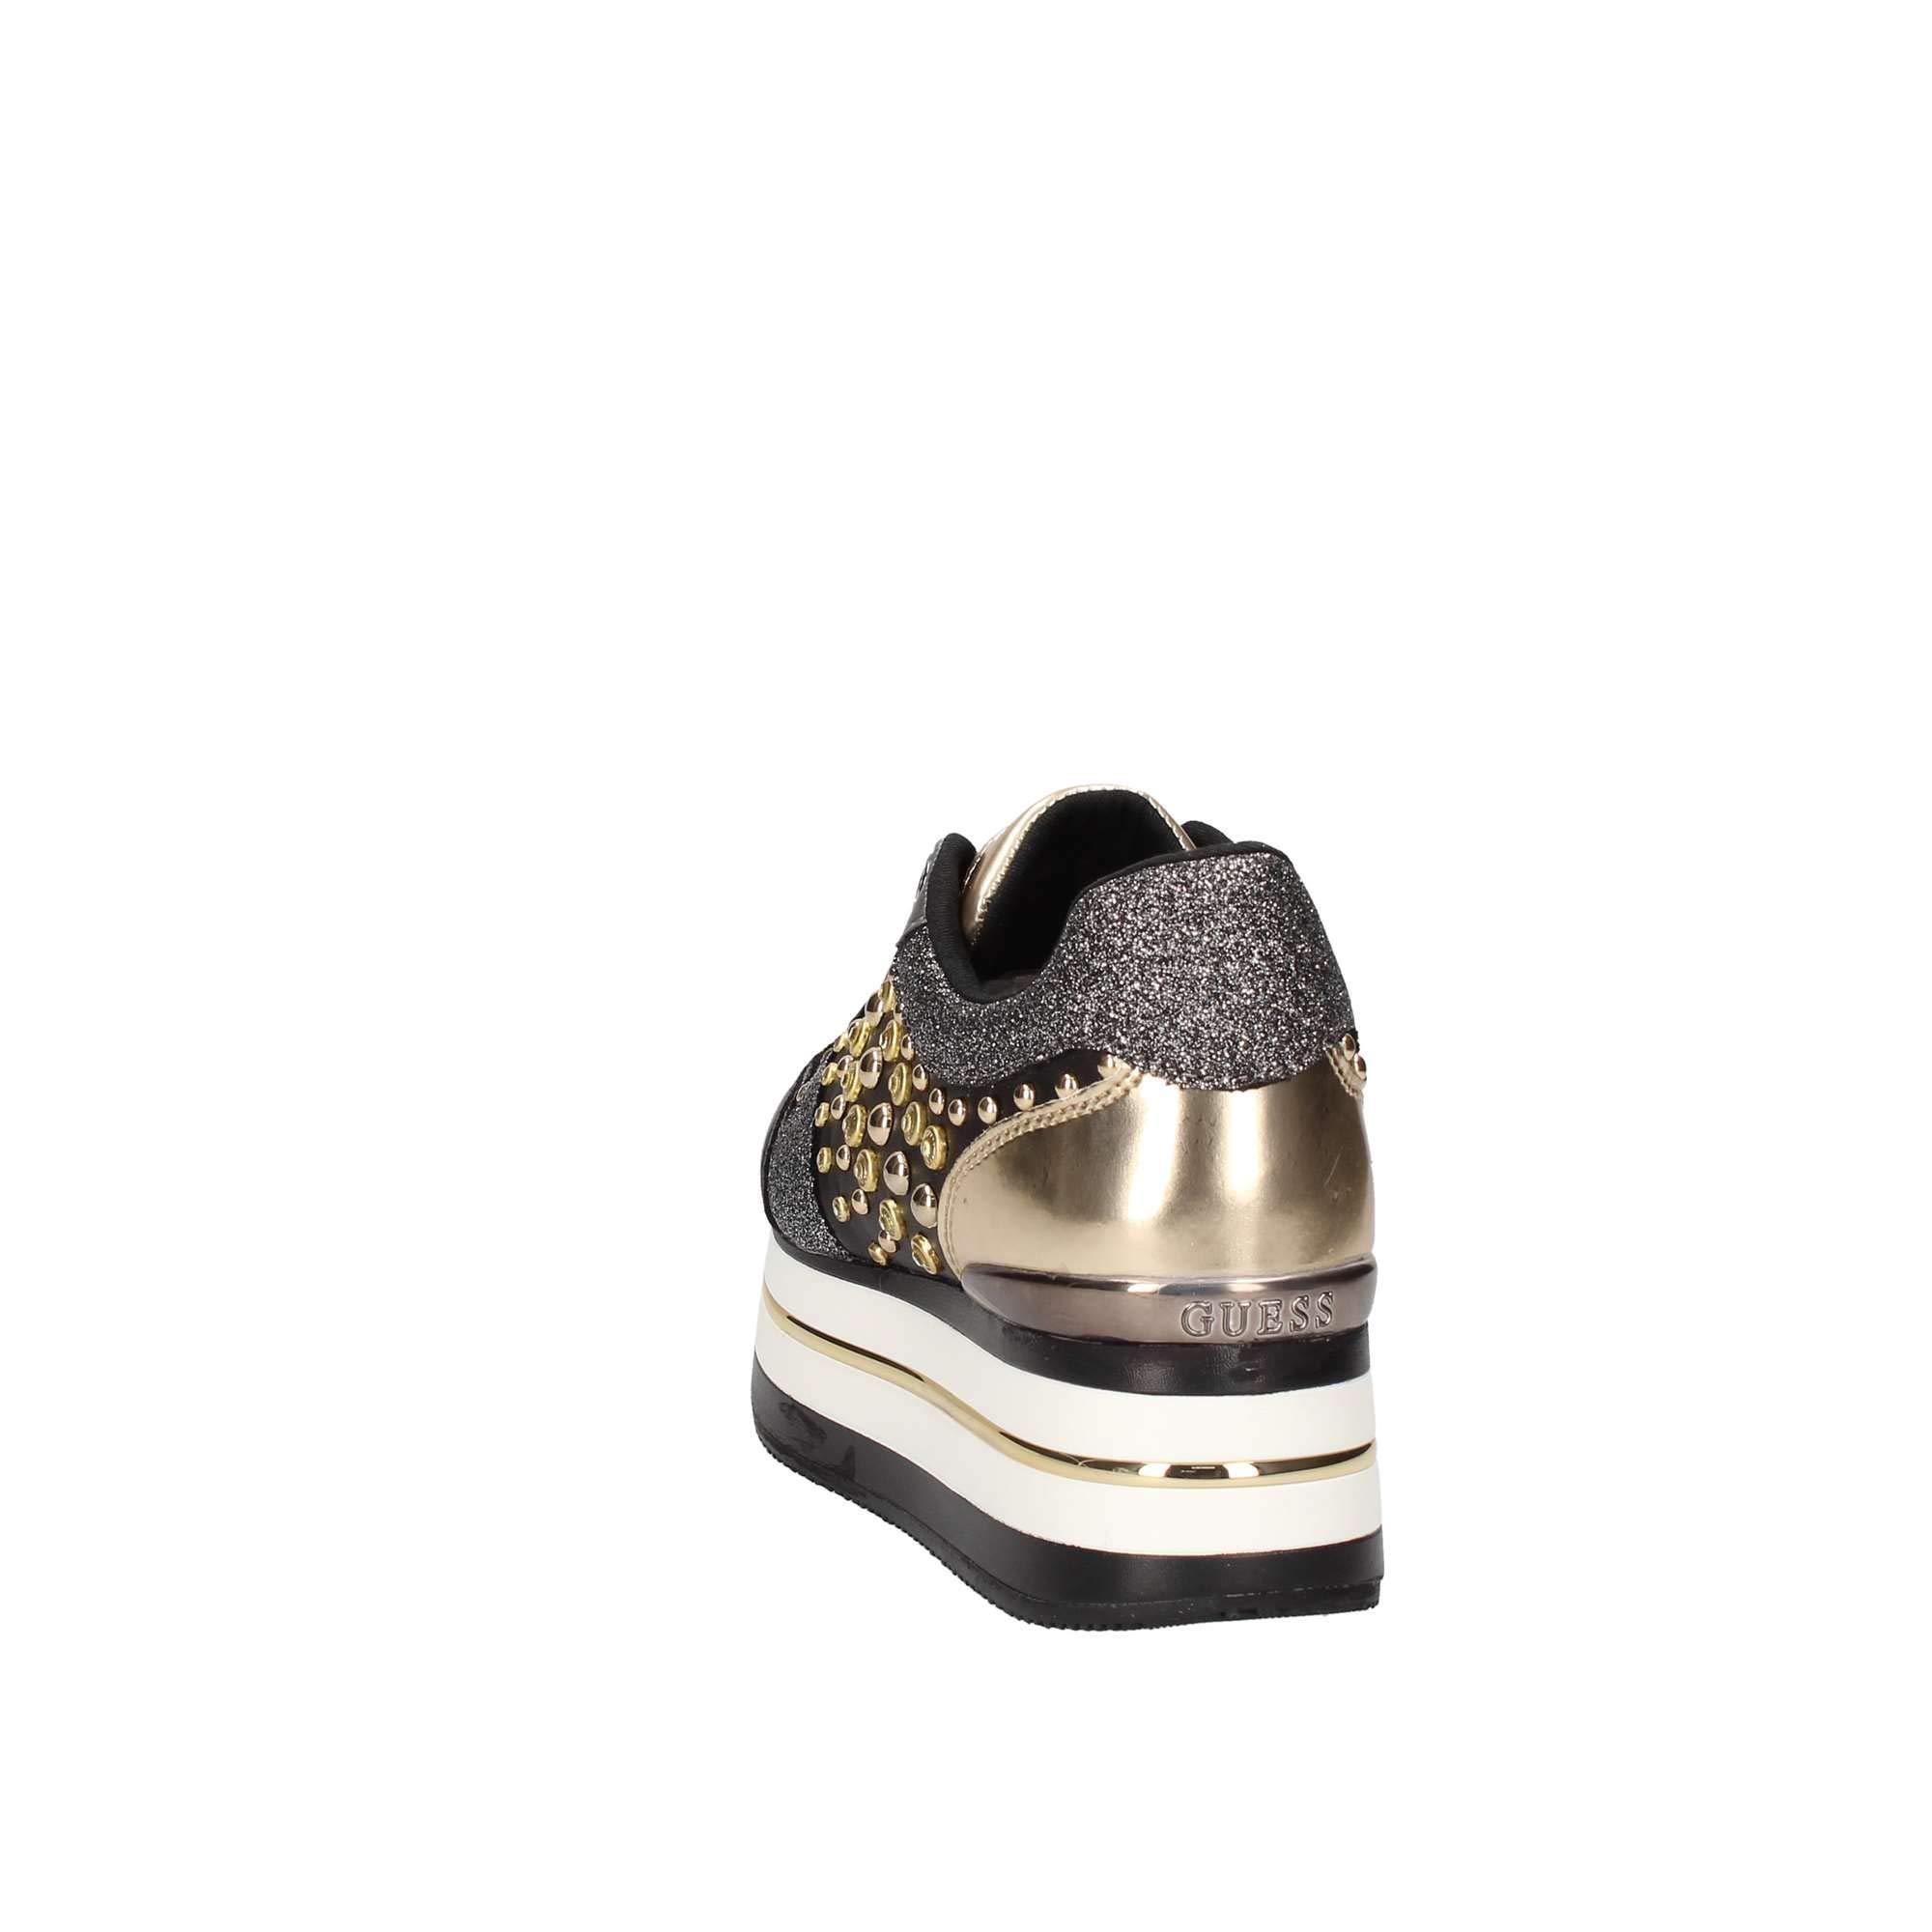 Guess Grooved Logo Print Sneaker   ricciano UNITED KINGDOM